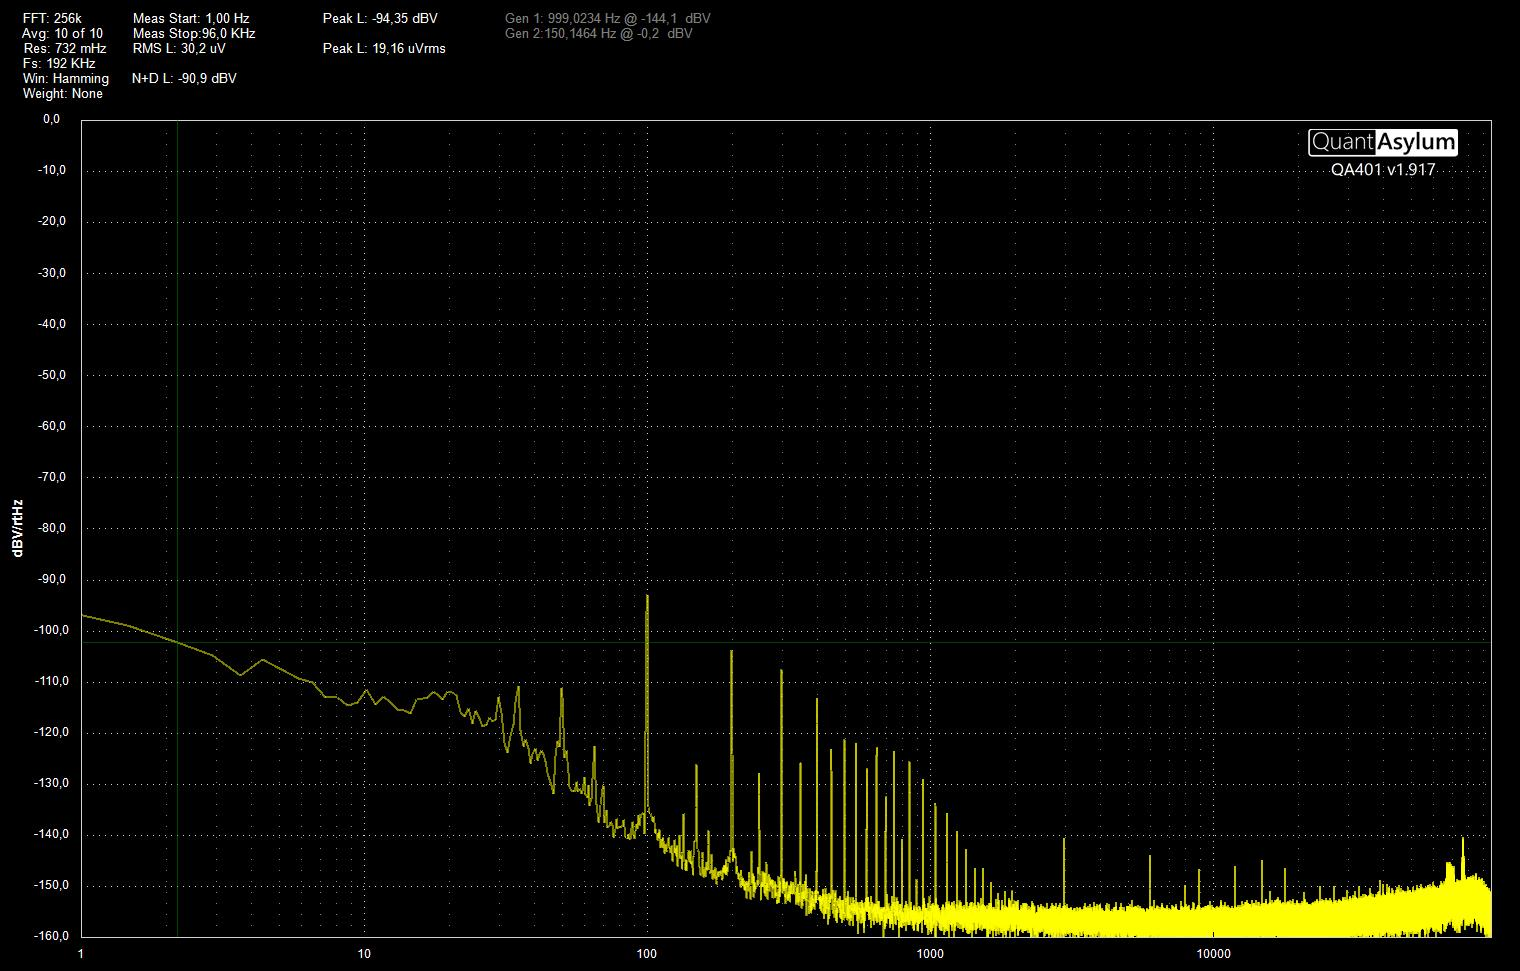 Traco TMT 15215 FFT 256k 10awg 192 kHz.jpg